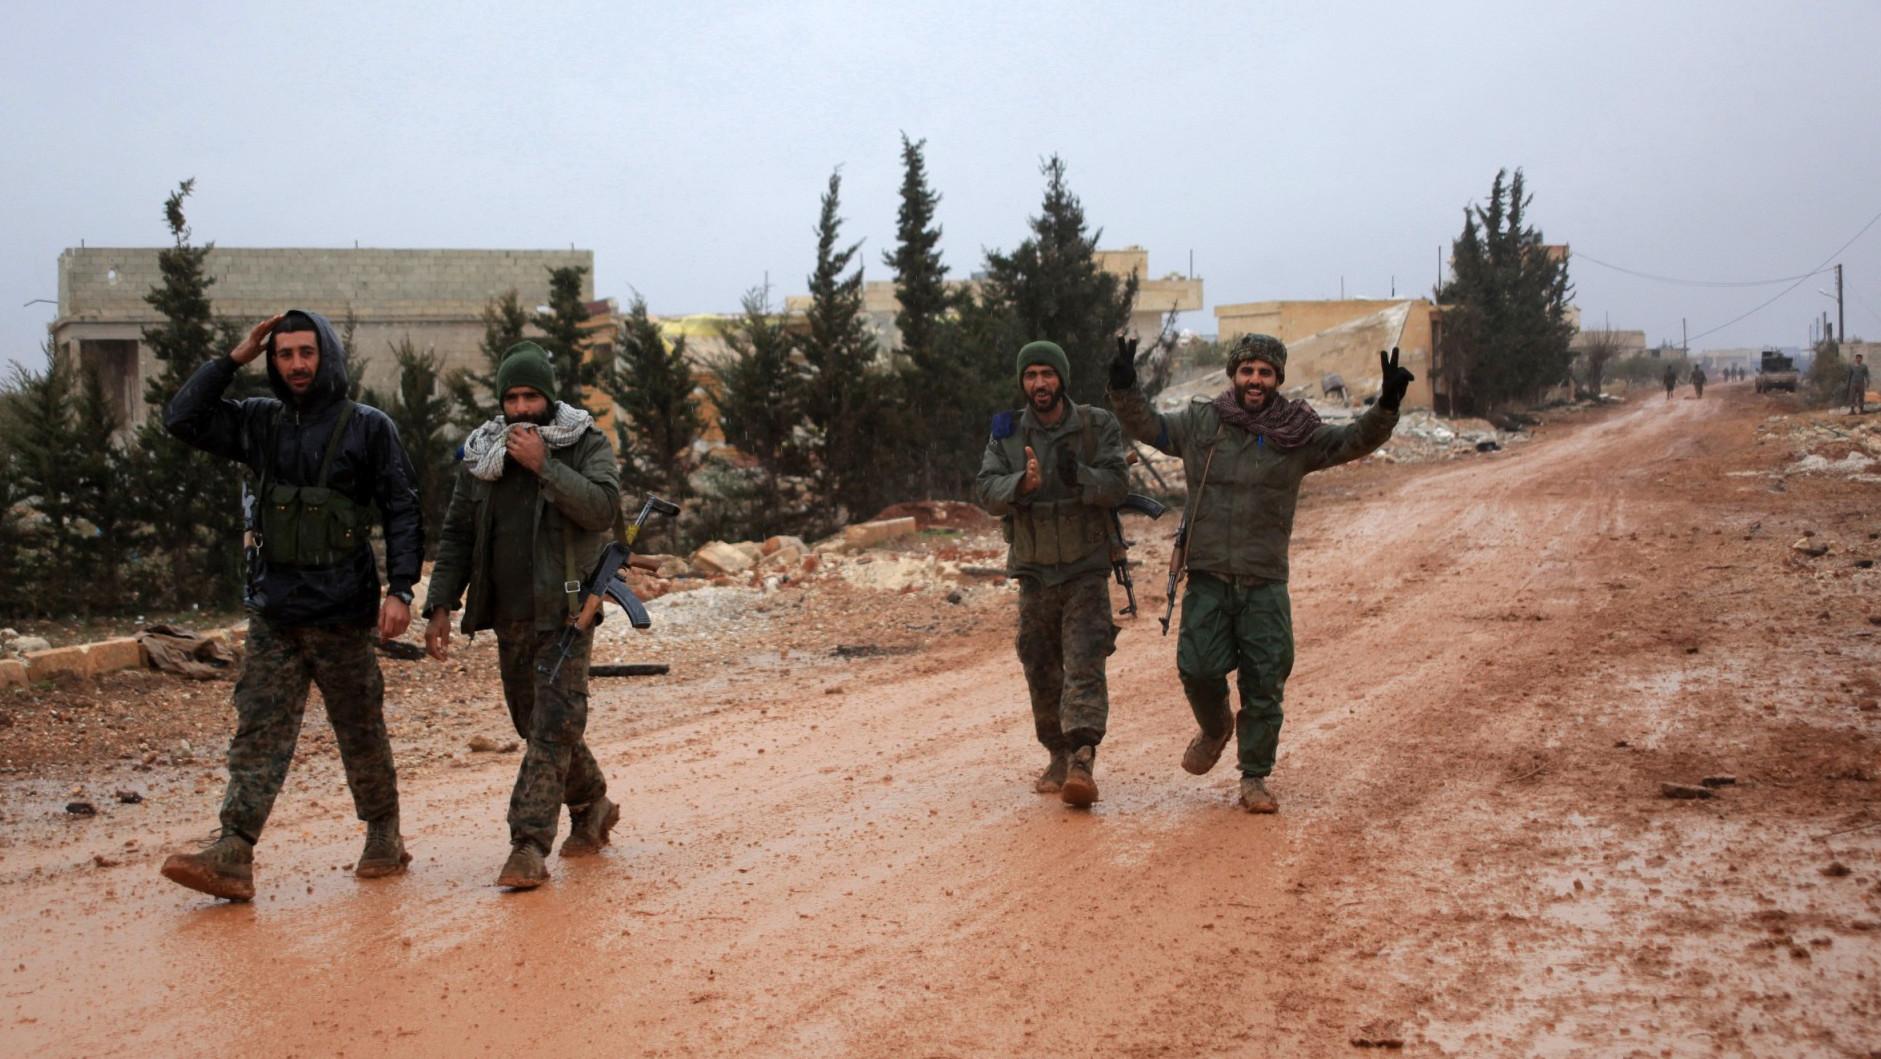 98 процентов территории Сирии освобождено отИГИЛ— Министерство обороныРФ